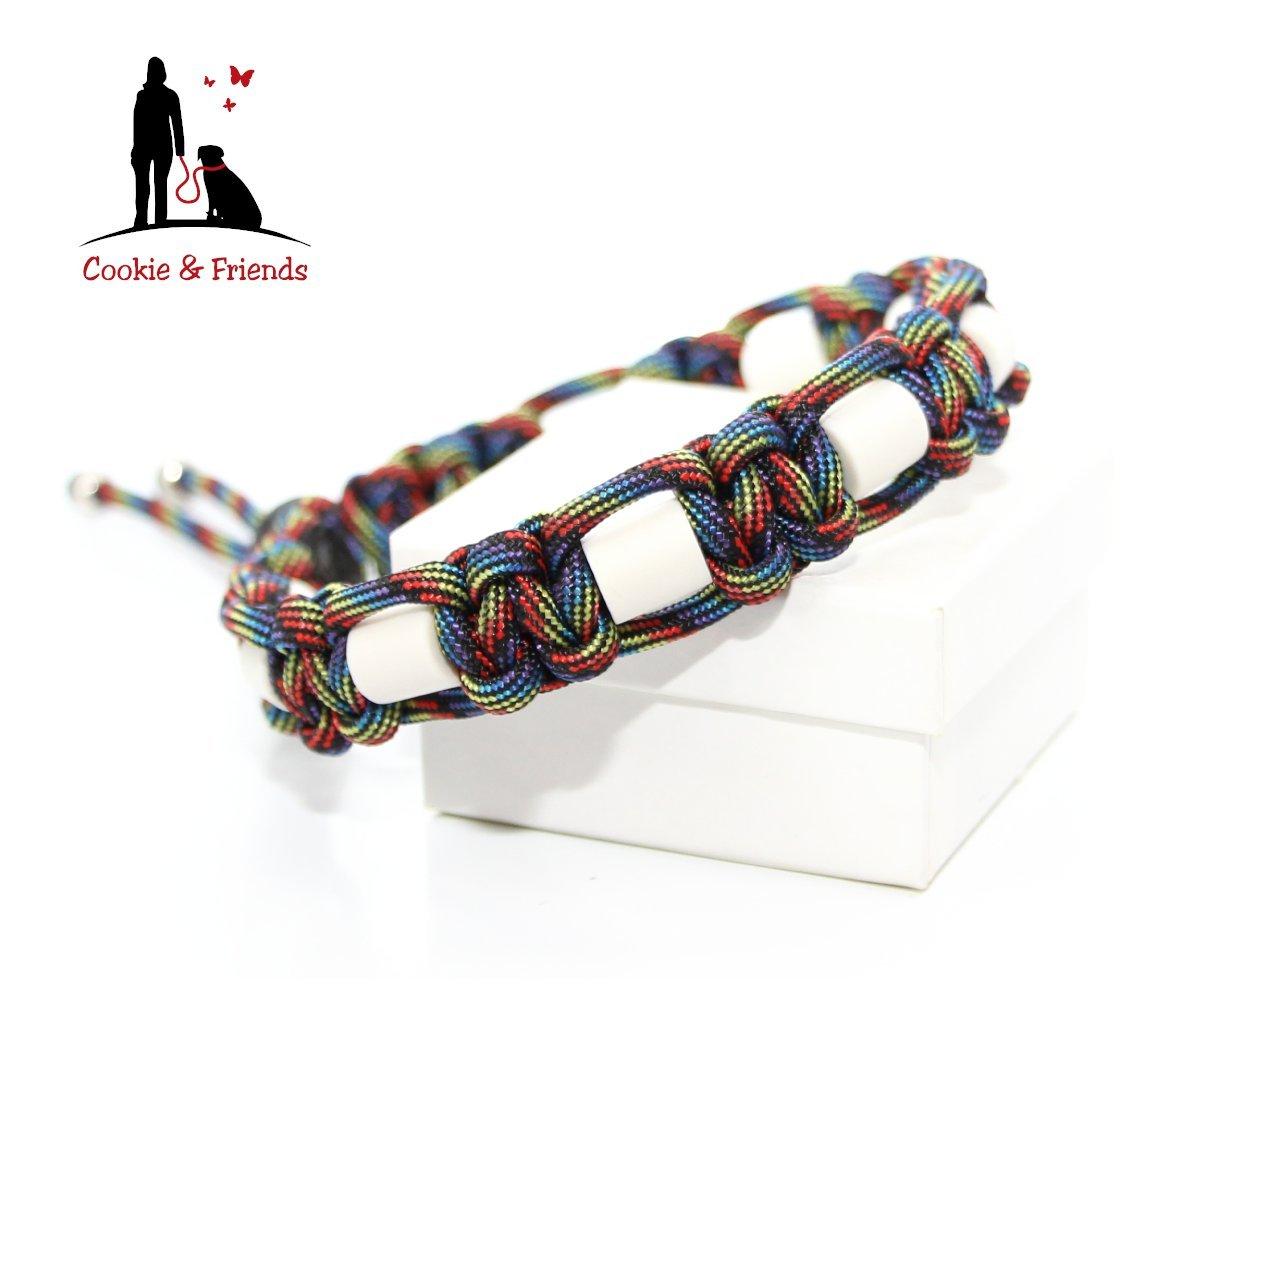 EM-Keramik Halsband, EM Keramik, Halsband EM Keramik, Hund, Hundehalsband, EM Keramik Farbe: Dark Rainbow